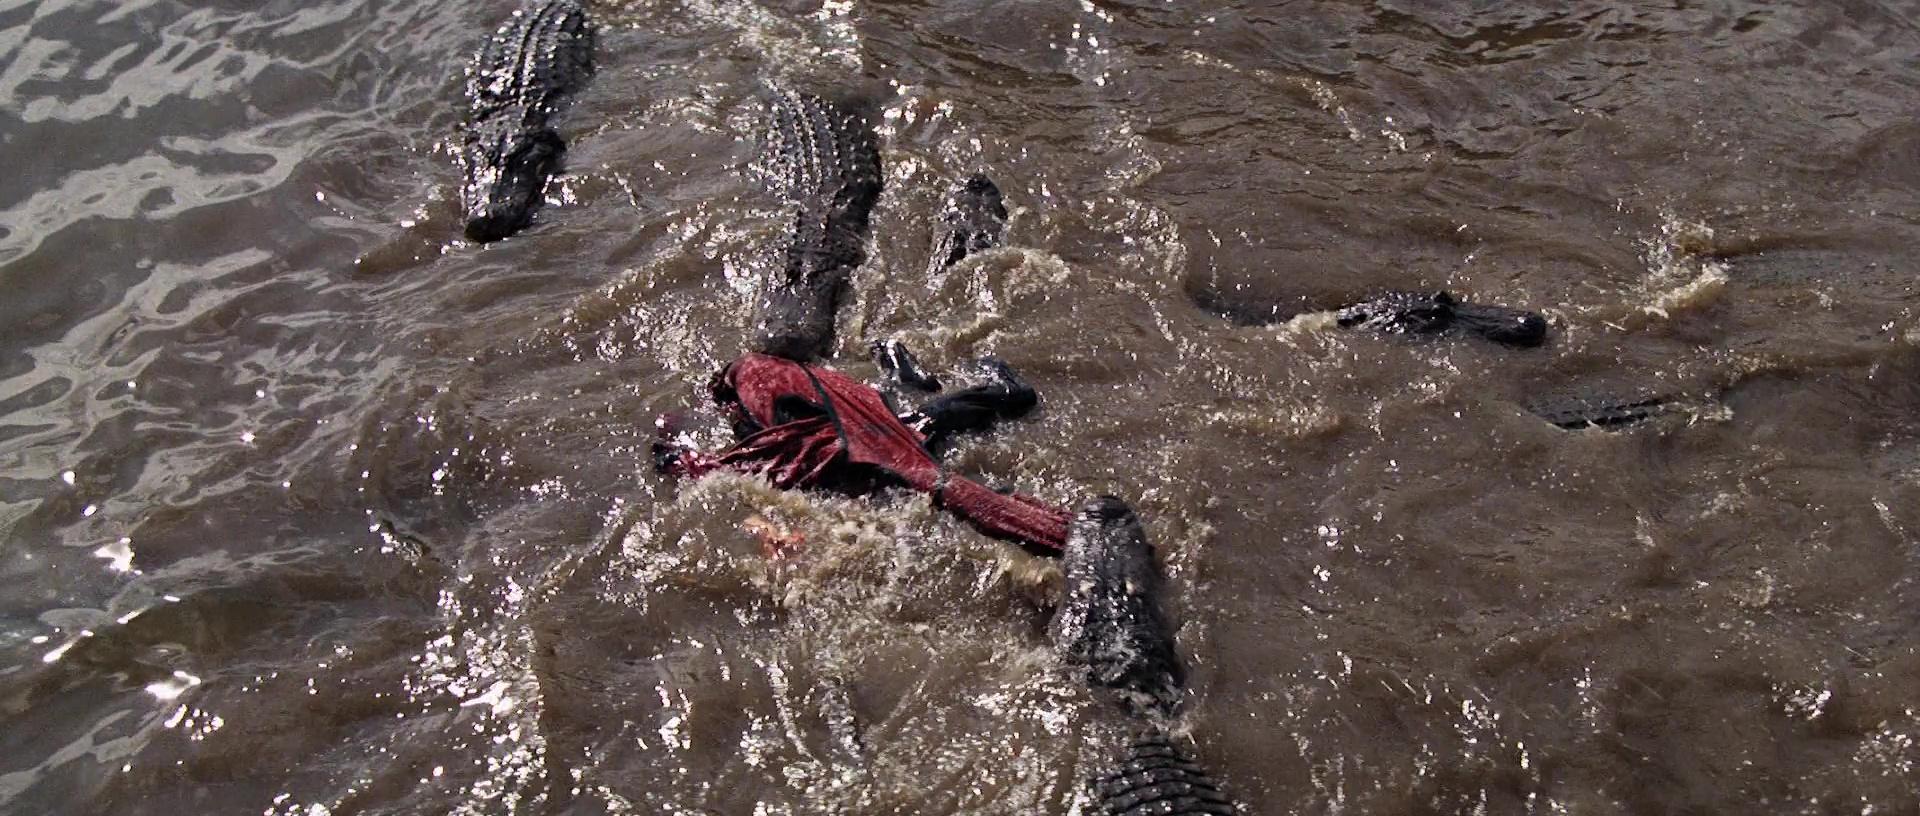 File:Death of Mola Ram.jpg